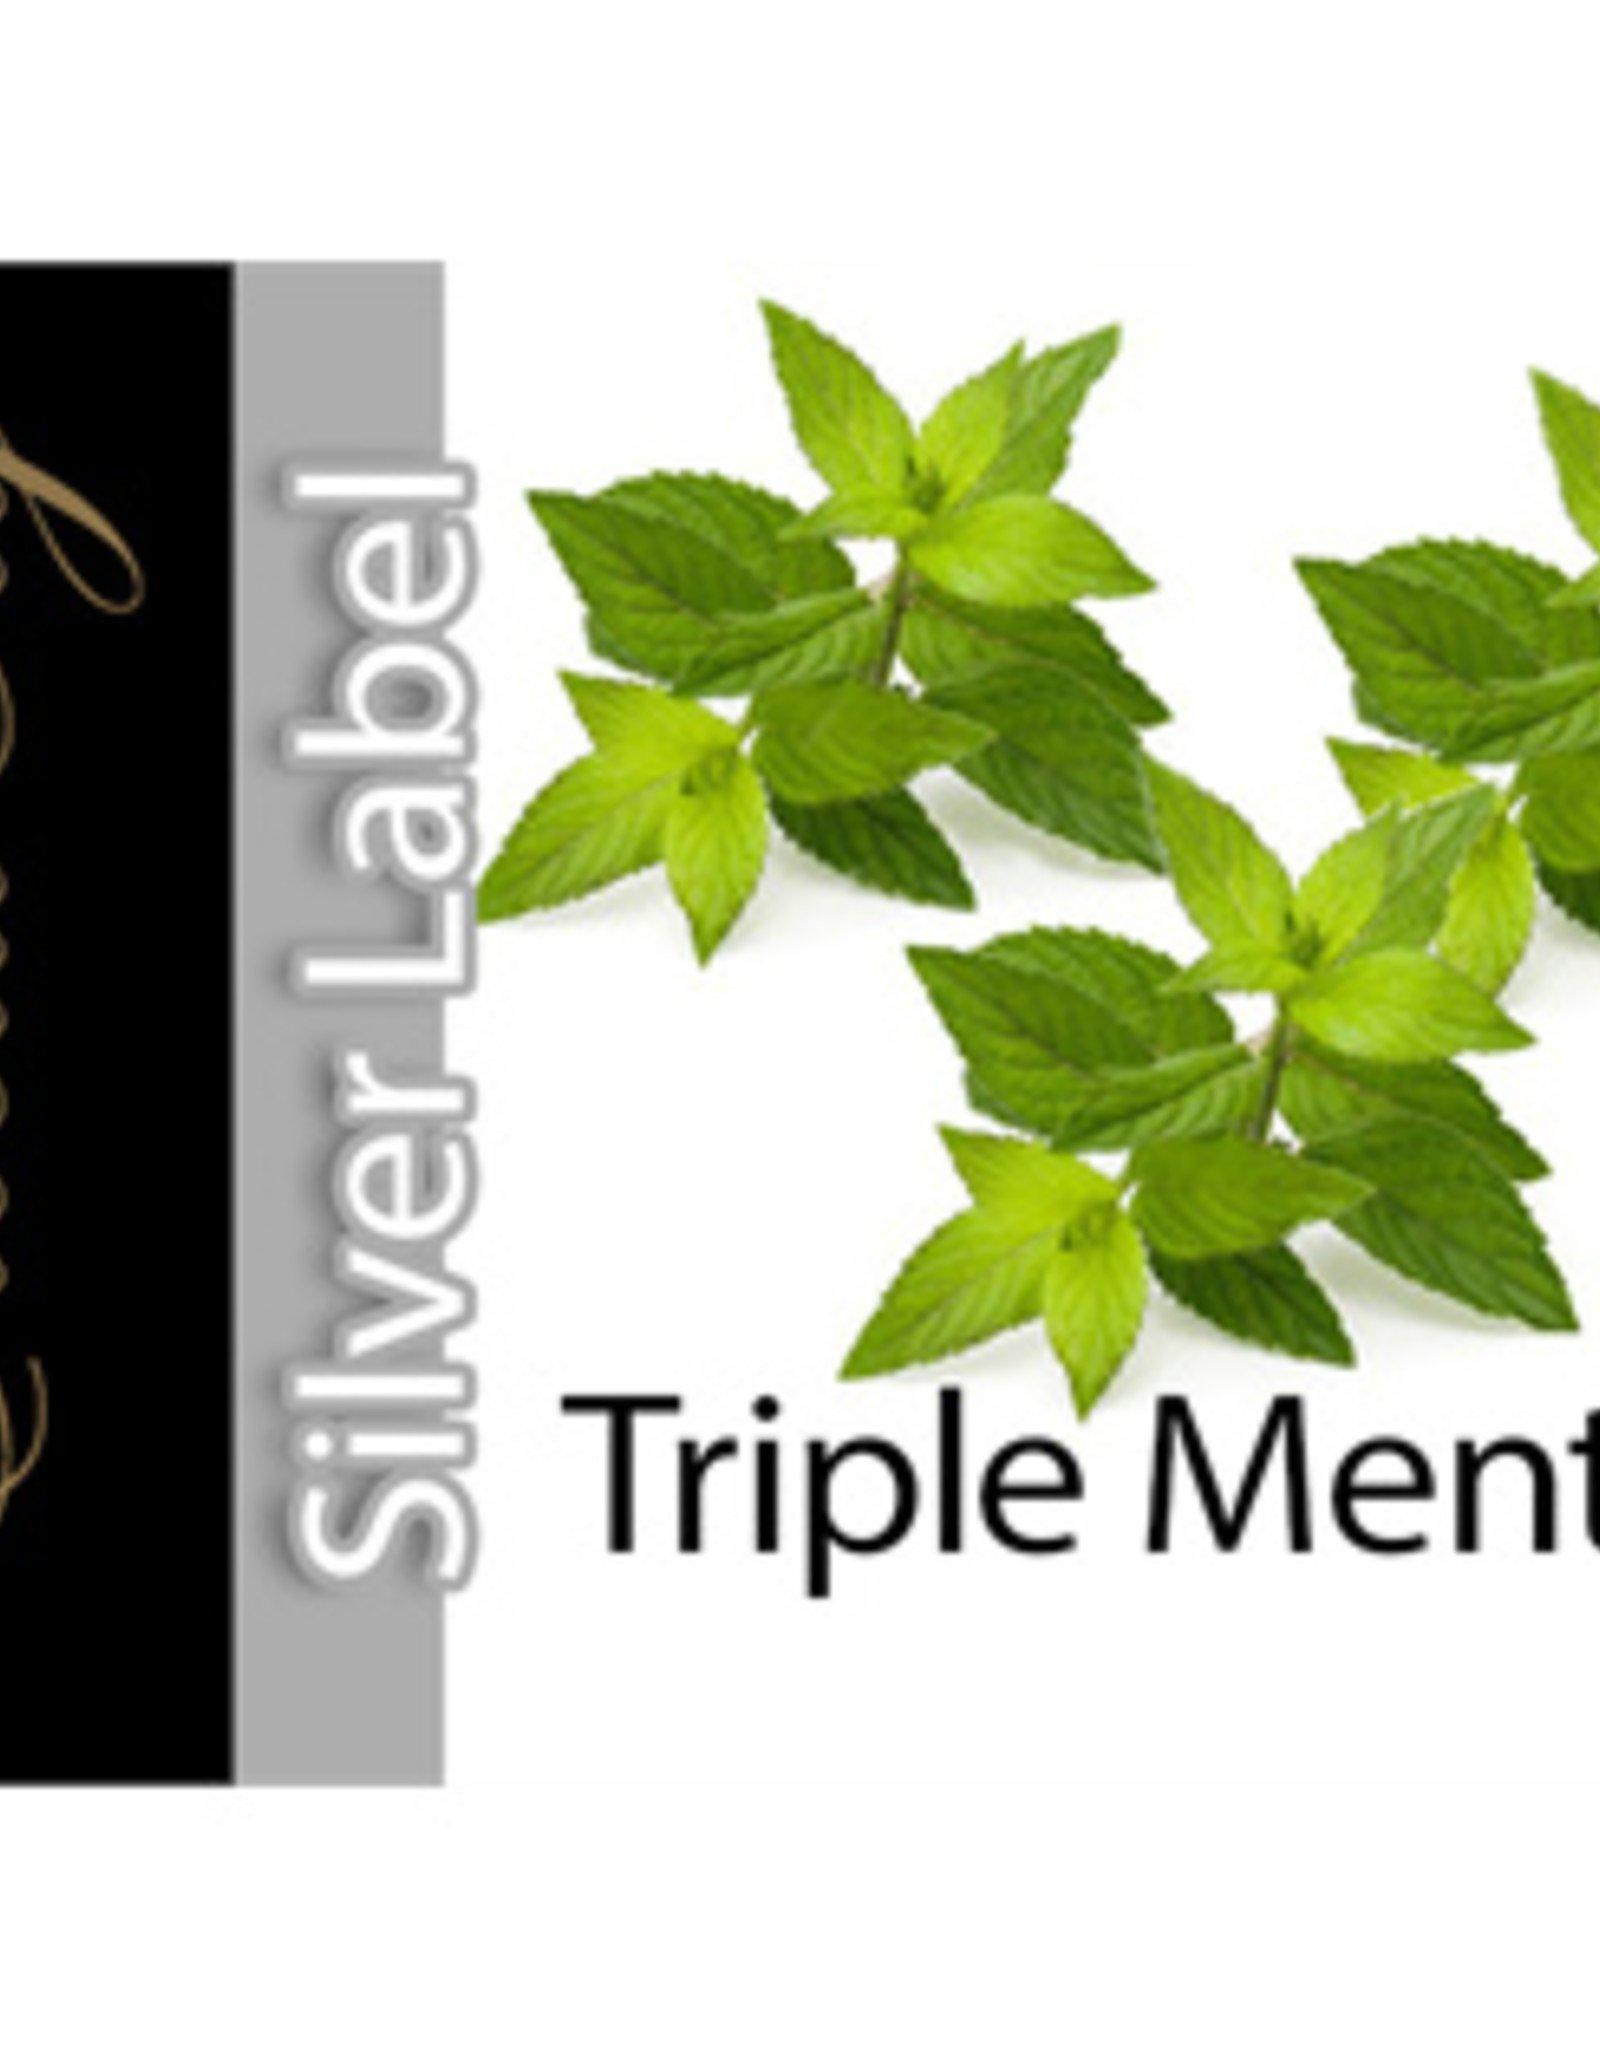 Exclucig Exclucig Silver Label E-liquid Triple Menthol 3 mg Nicotine